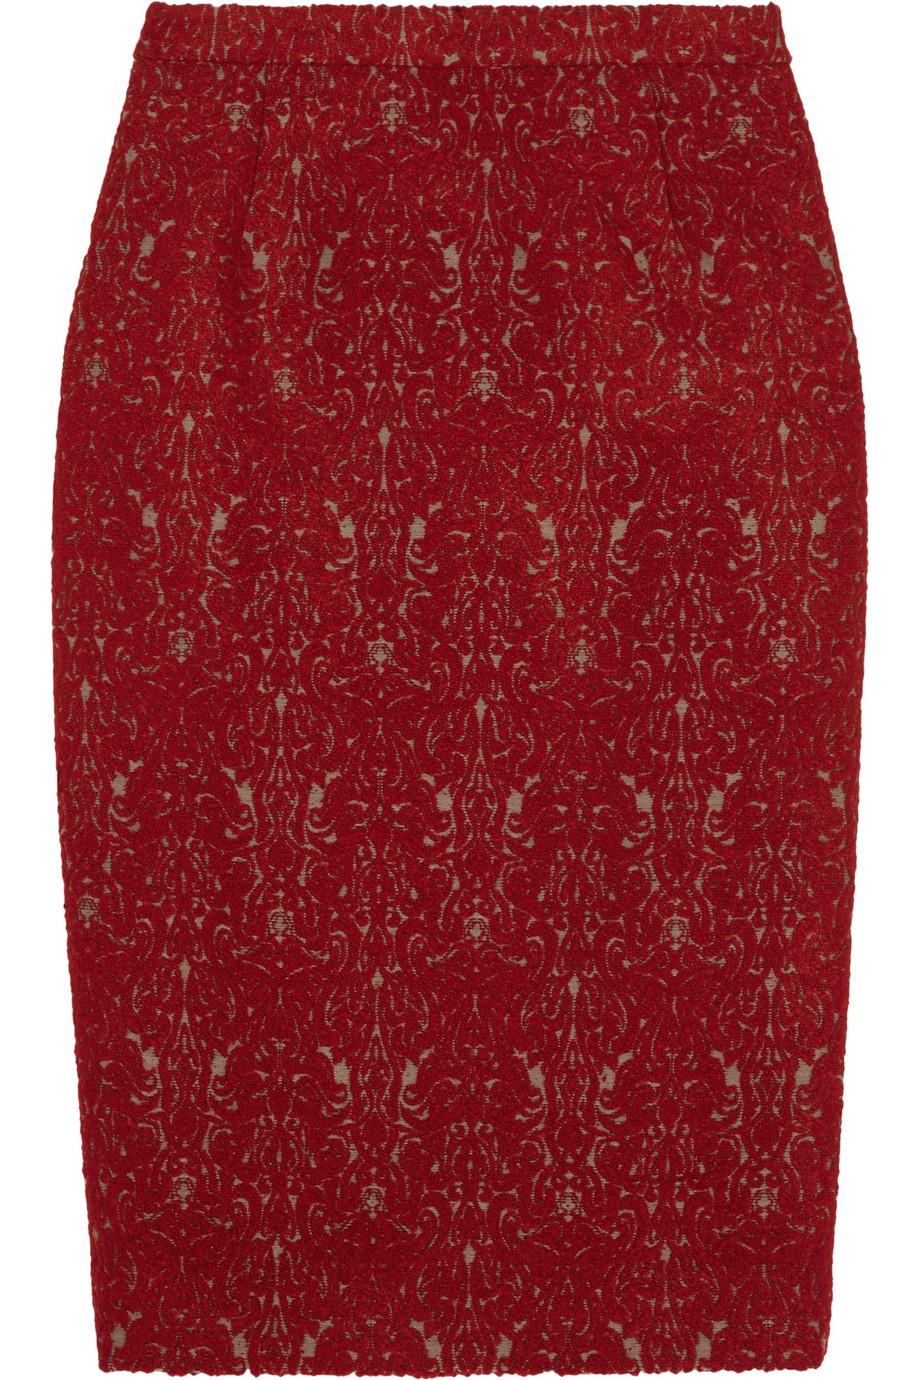 Tory burch debra jacquard skirt – 60% at the outnet.com